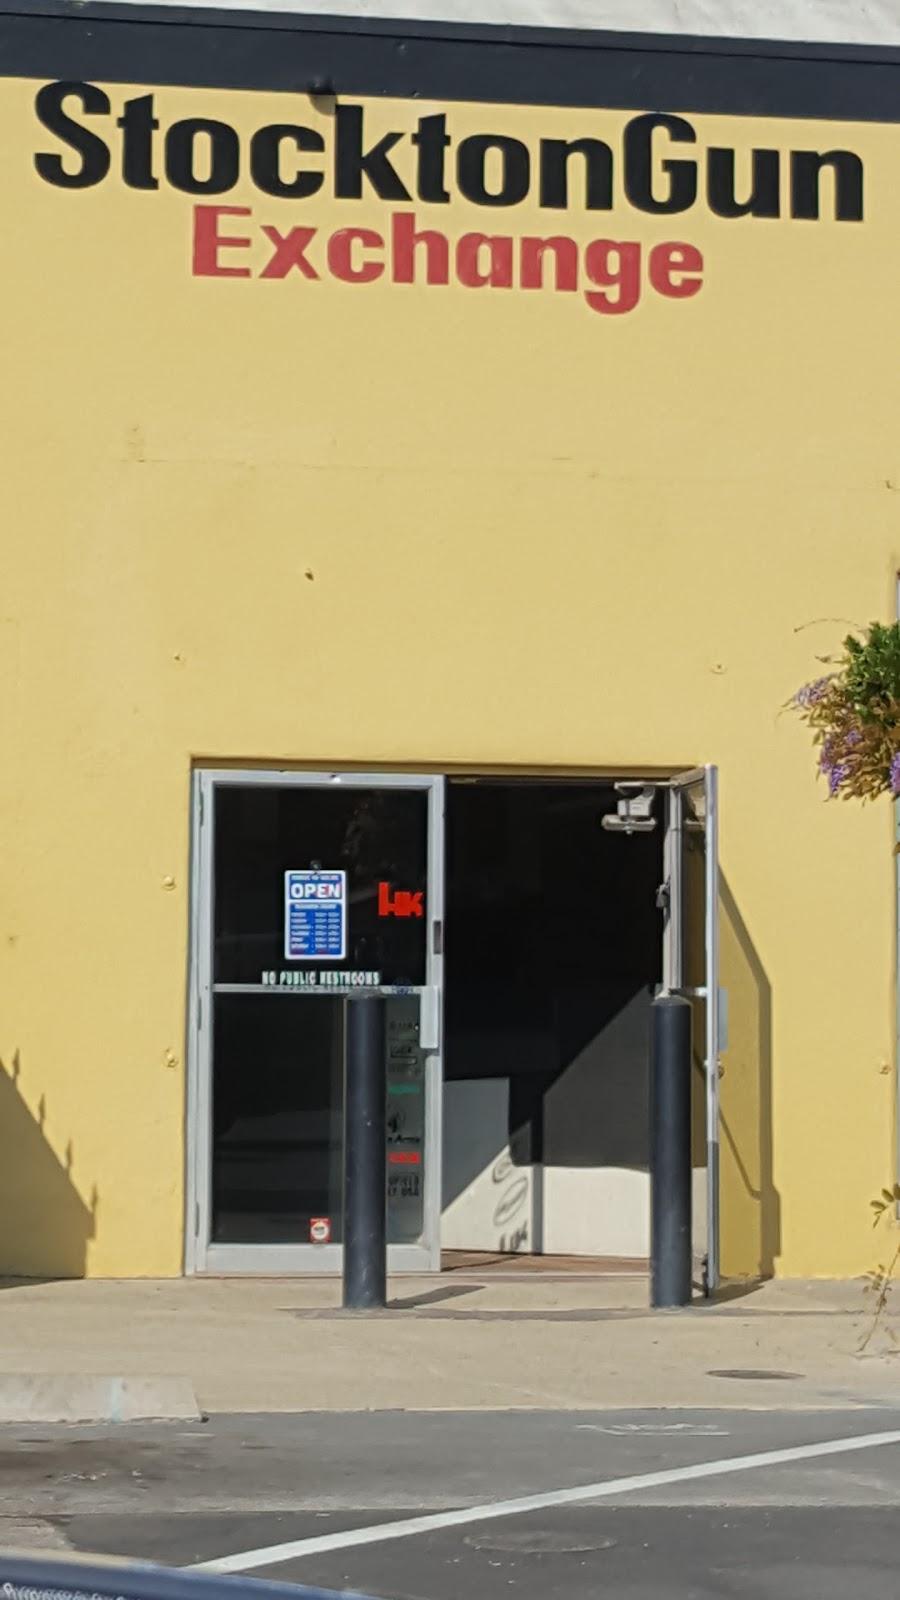 Stockton Gun Exchange - store  | Photo 1 of 1 | Address: 1732 Pacific Ave, Stockton, CA 95204, USA | Phone: (209) 466-4867